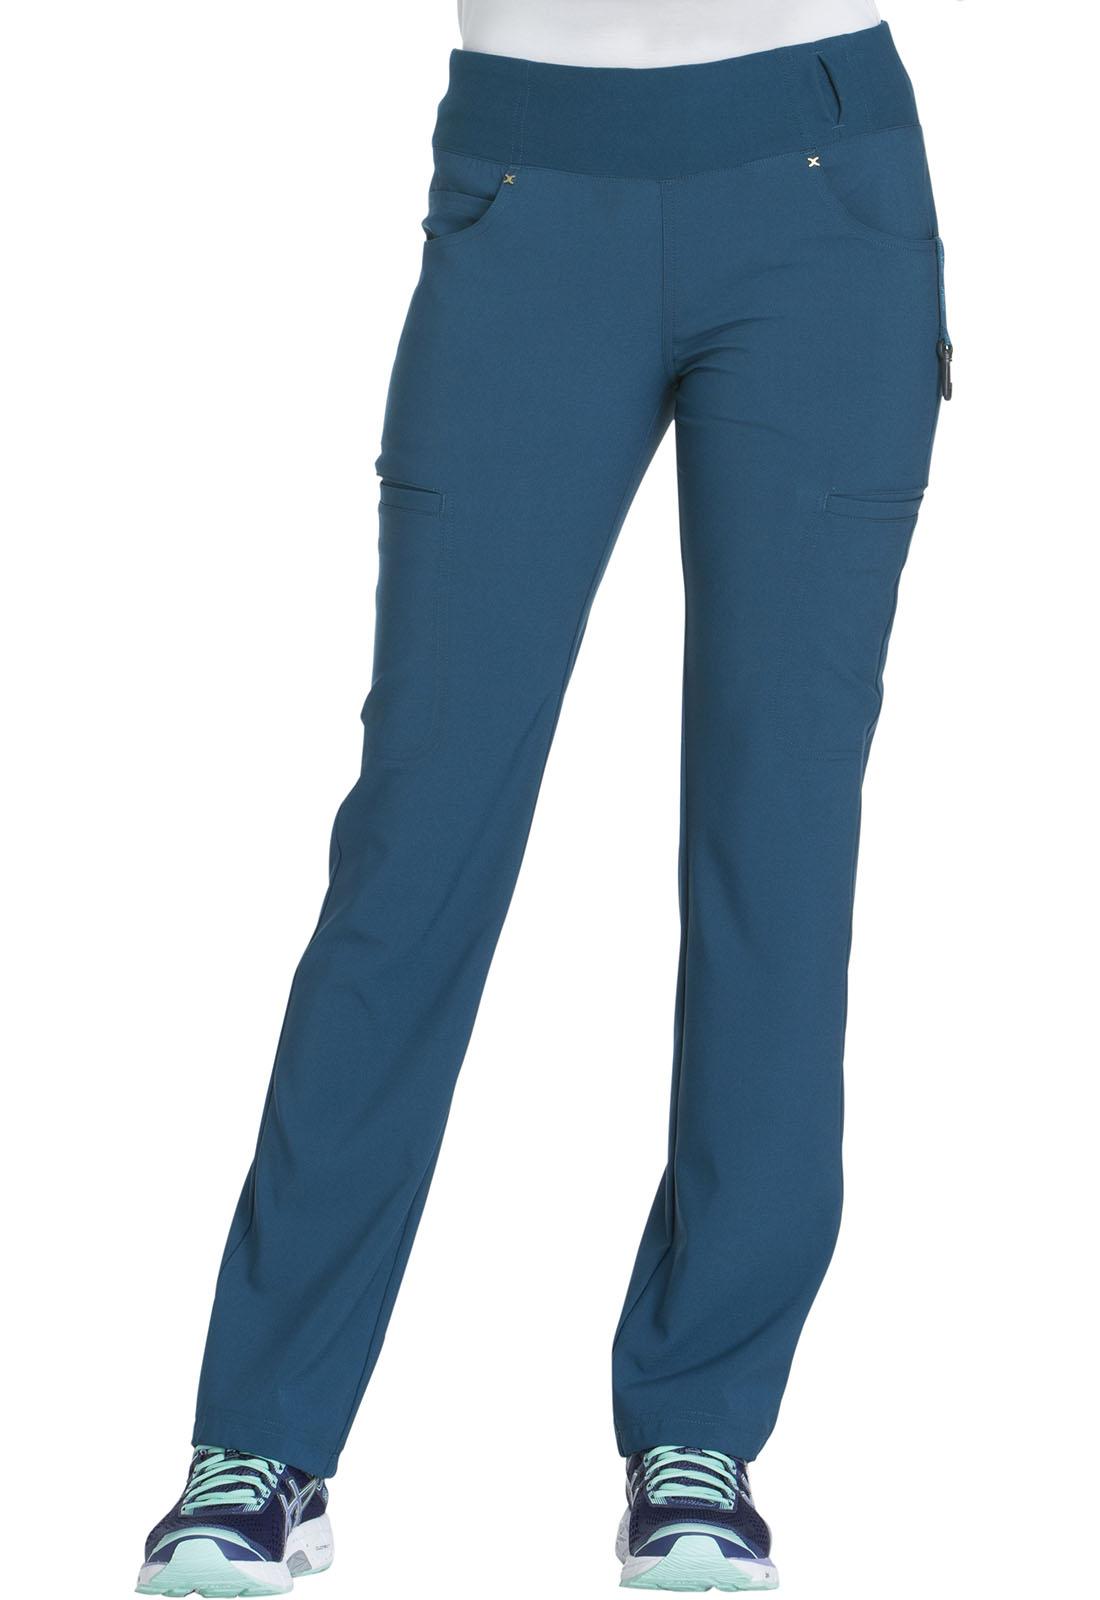 c99c2049d44 iFlex Mid Rise Straight Leg Pull-on Pant in Caribbean Blue CK002-CAR ...